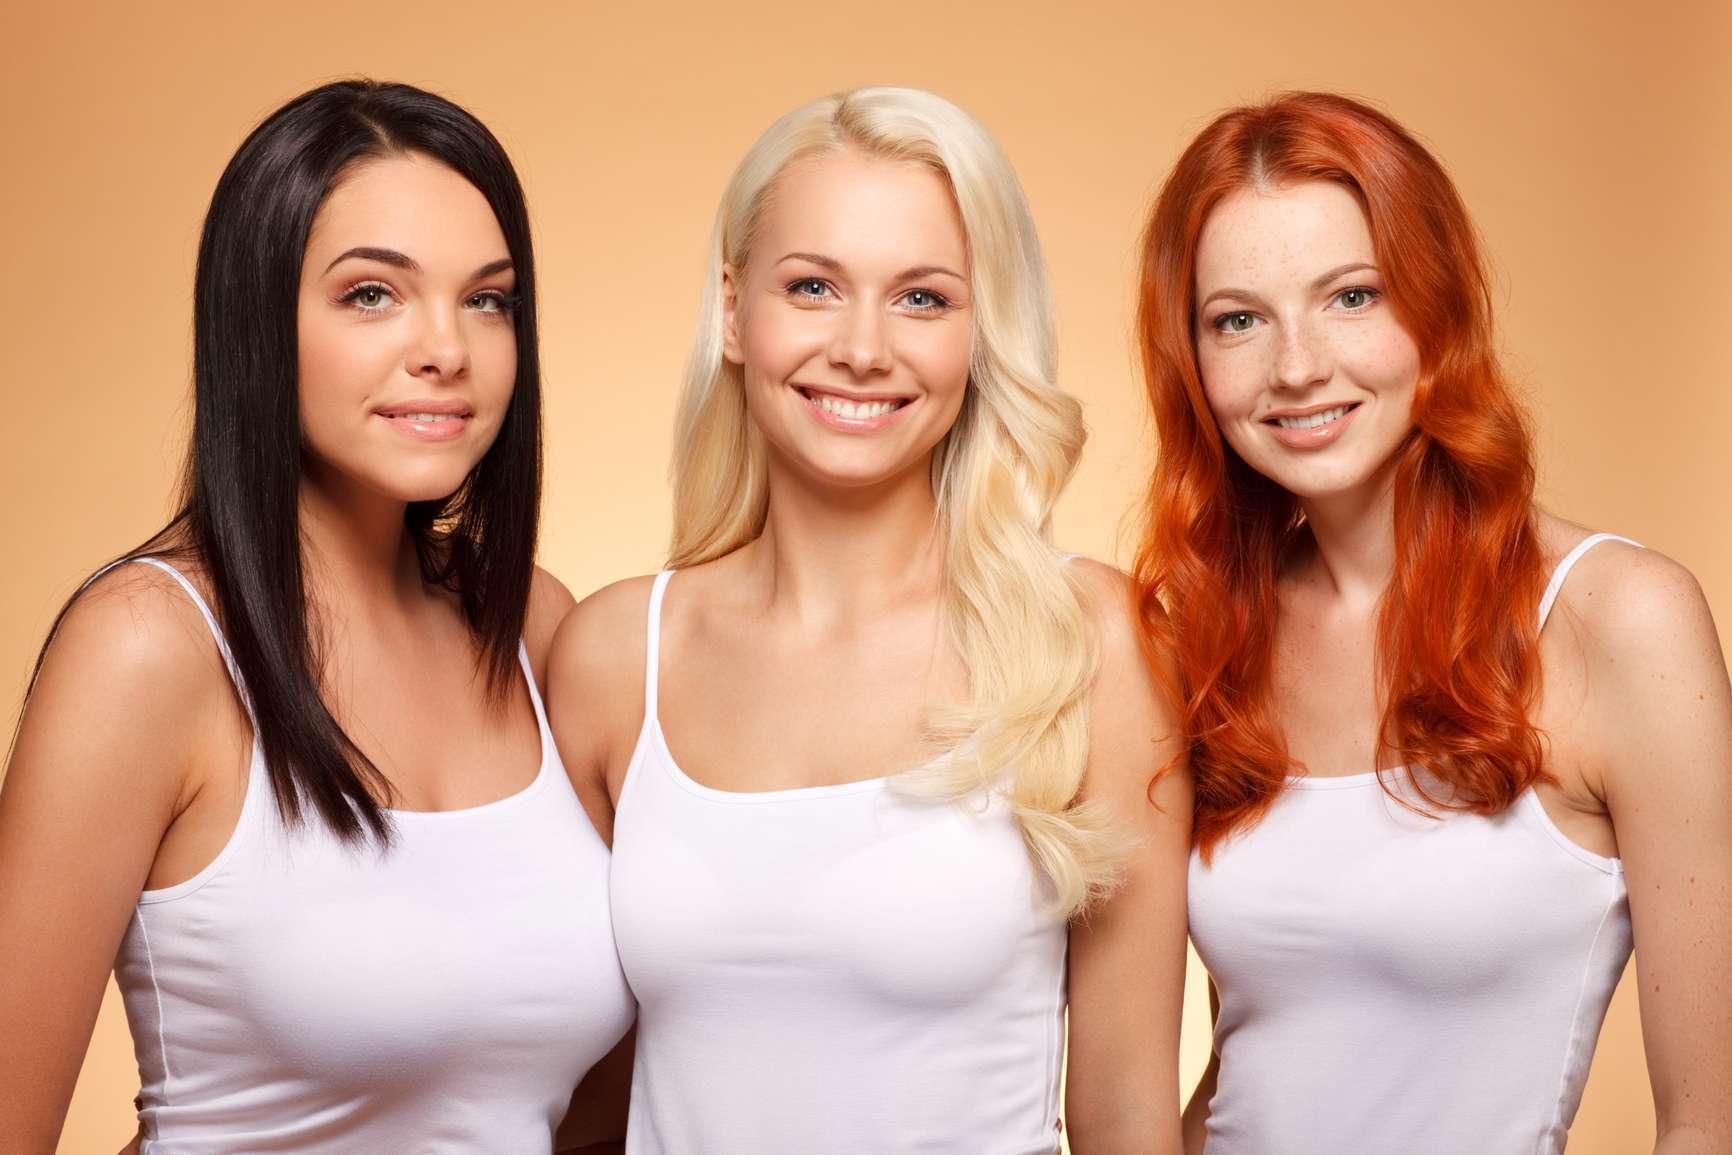 Какой цвет волос тебе подходит по фото